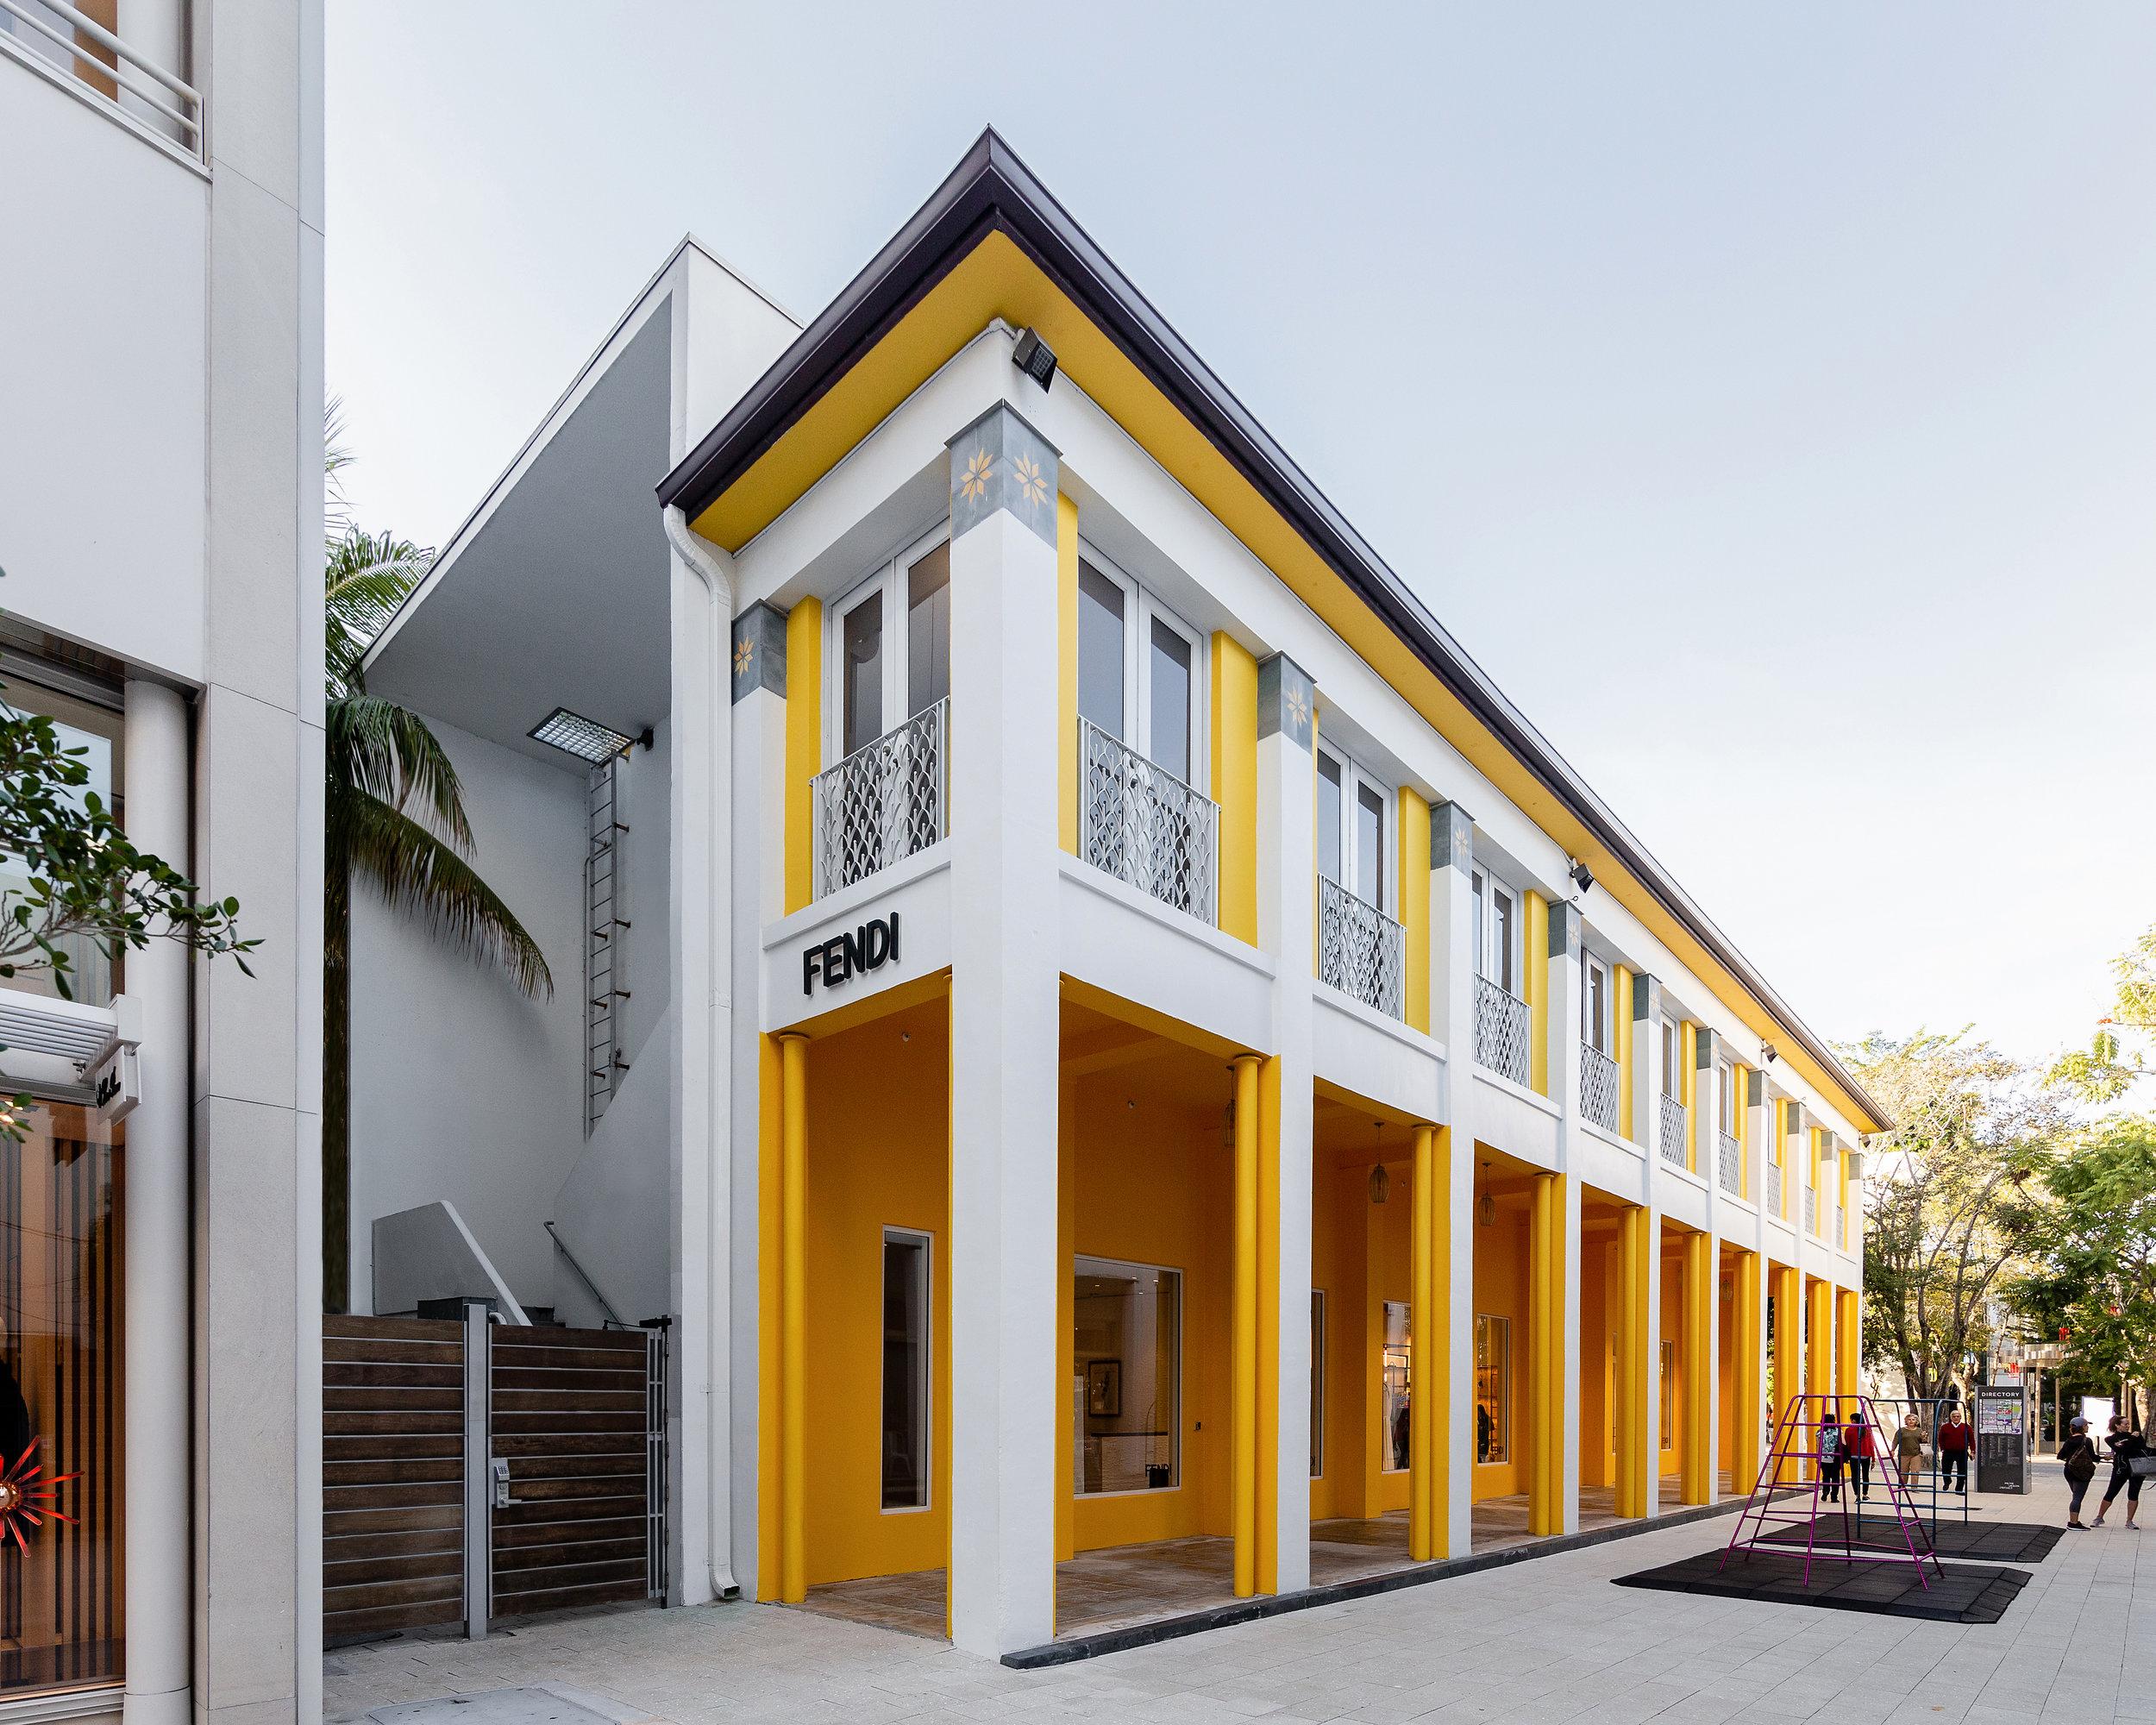 angelo-melo-miami-photographer-design-district-fendi-building.JPG